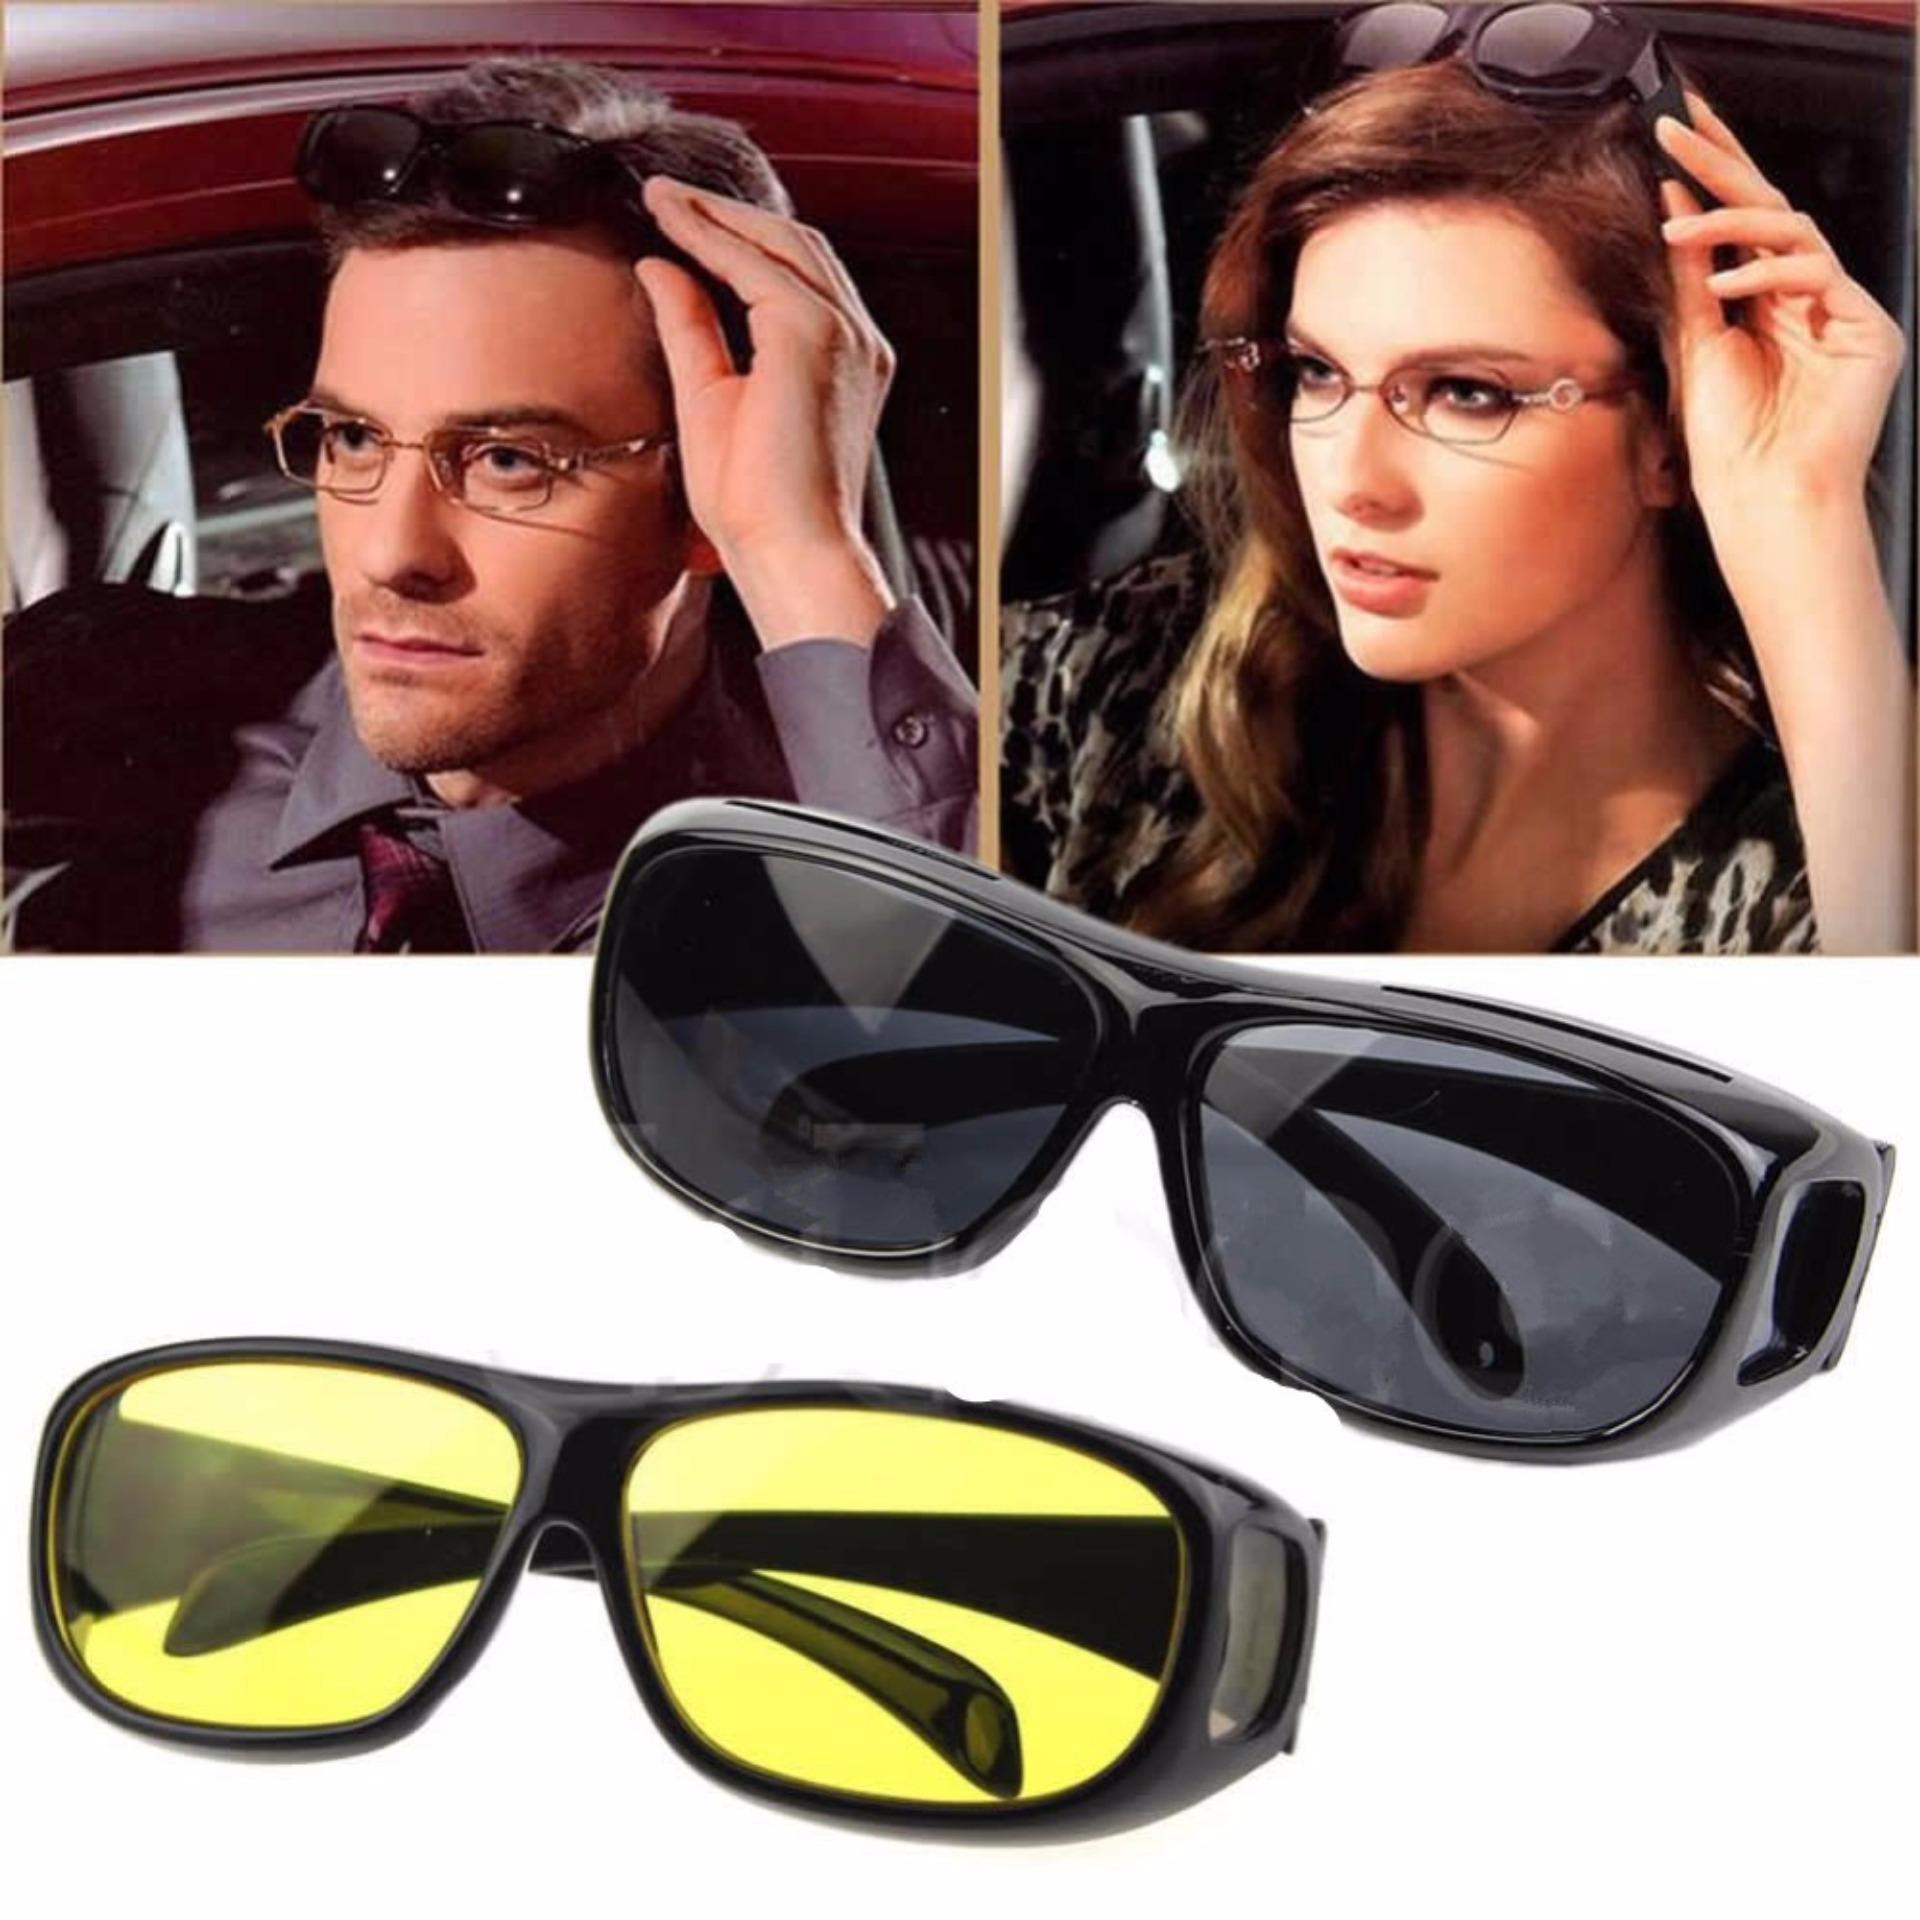 Jual Vision X Aviator Design Kacamata Penerang Malam Hari Glasses Source · Drcolections Kacamata Anti Silau HD Vision Wrap Arounds Isi 2 pcsSiang Malam